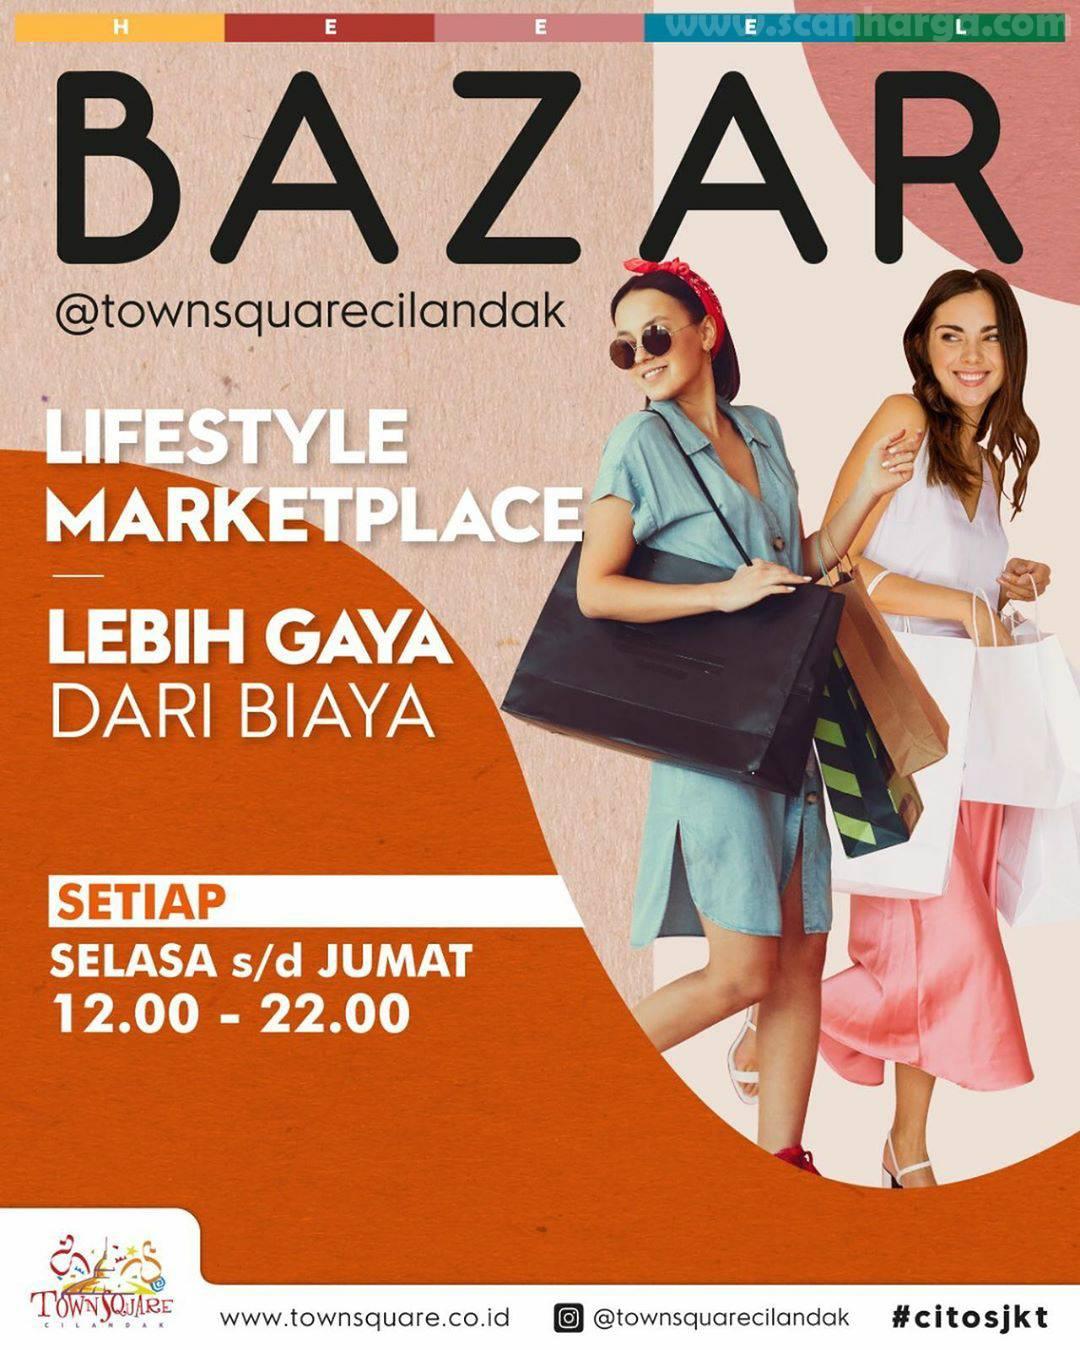 CITOS Bazar Town Square Cilandak* Lifestyle Marketplace Lebih Gaya Dari Biaya Setiap Selasa - Jumat